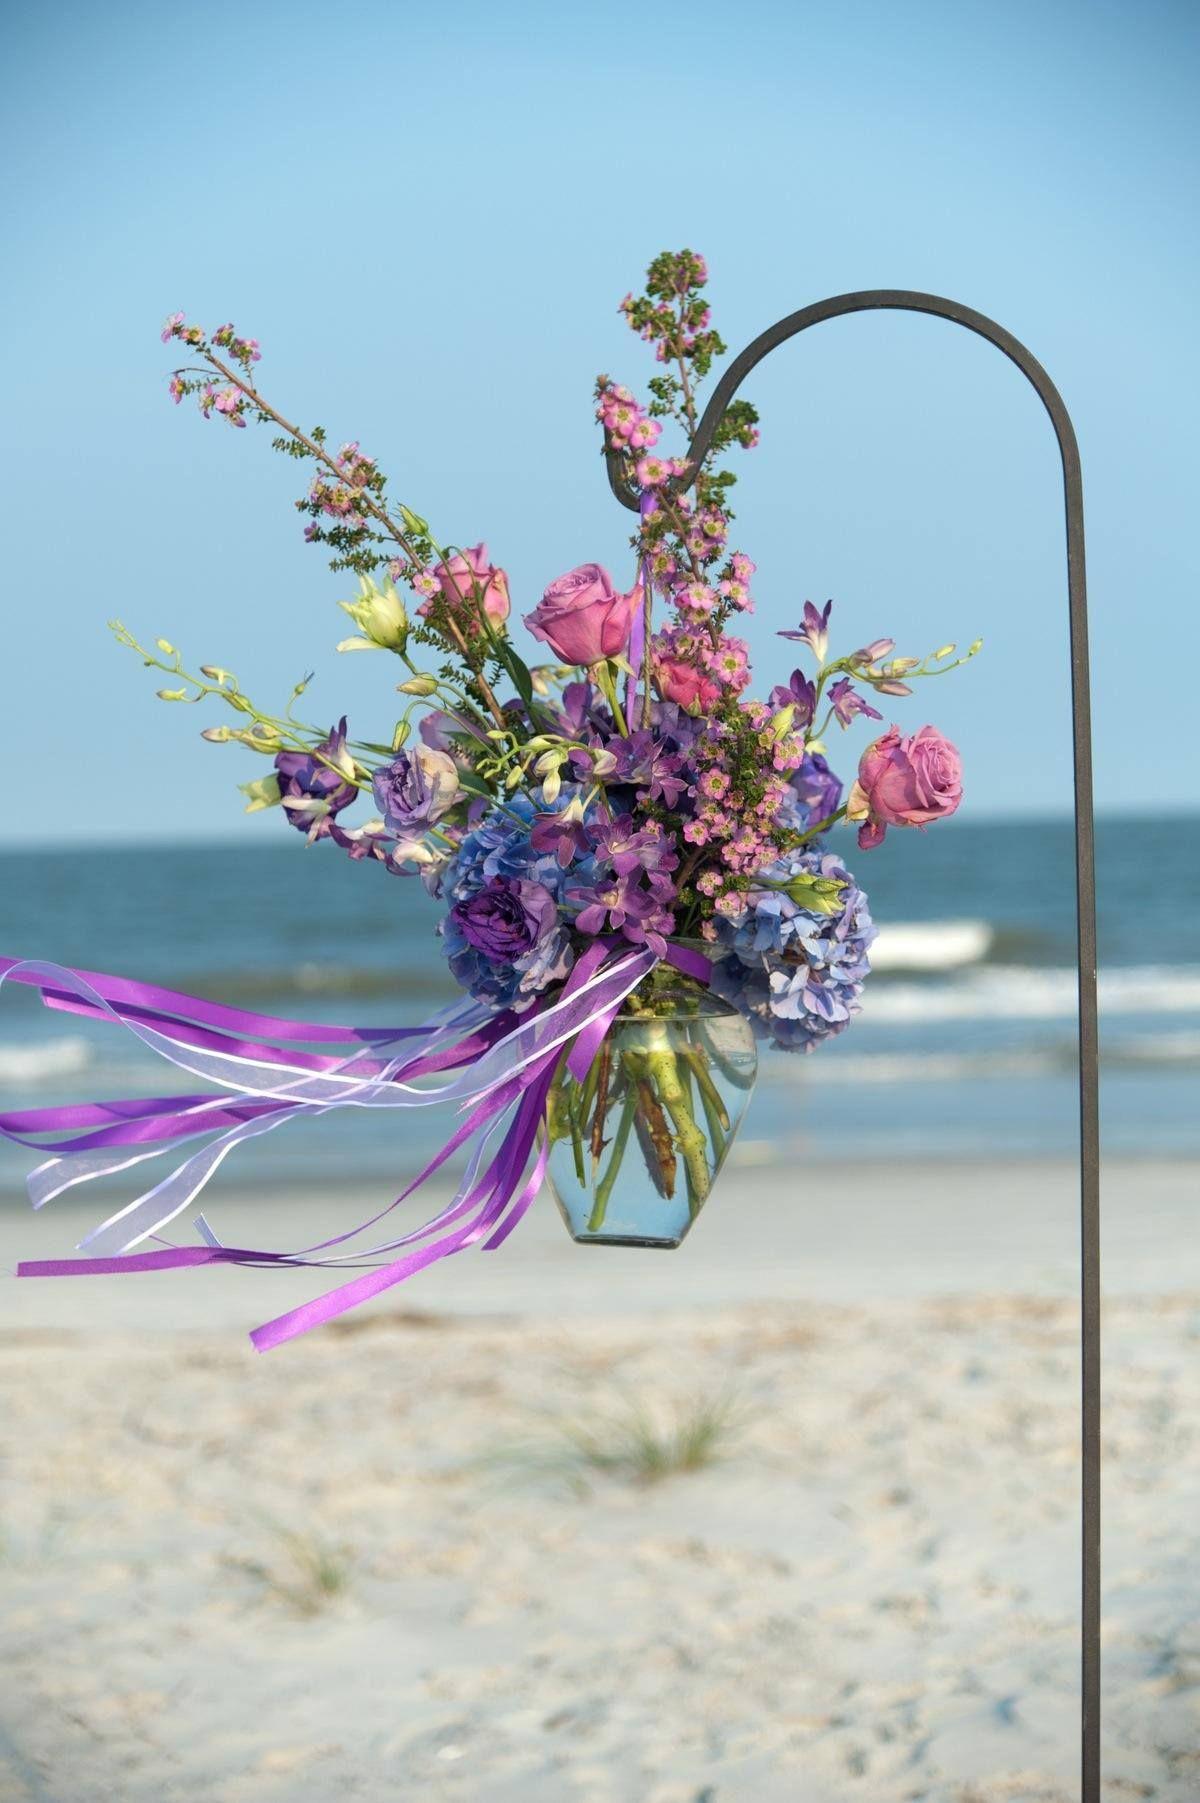 Beach wedding decorations diy  Pin by Ariane Szeliga on Wedding  Pinterest  Wedding